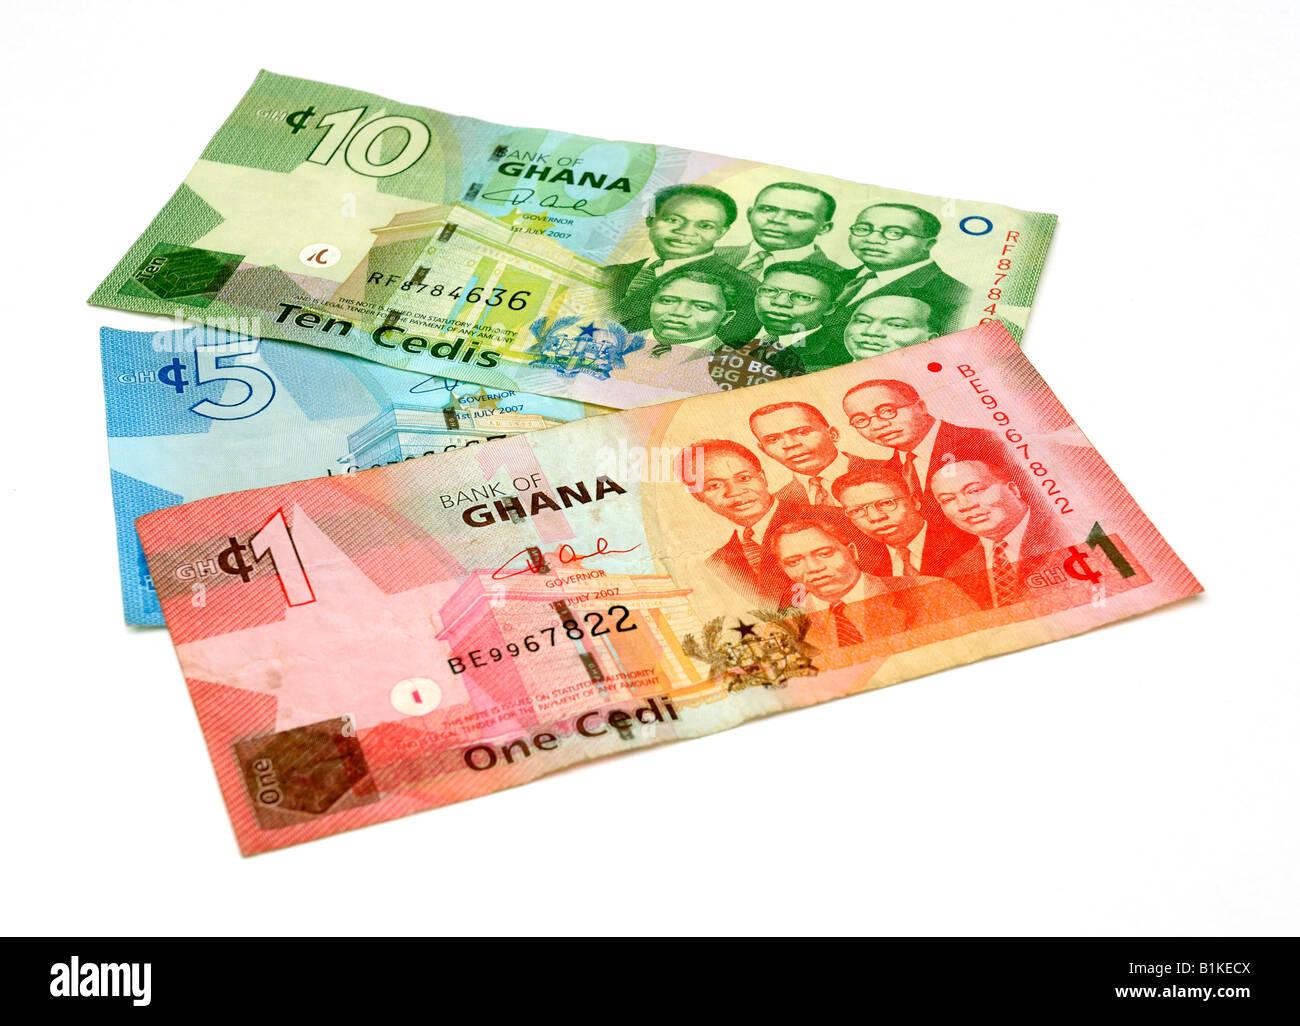 ghana bank notes stock photo 18253450 alamy